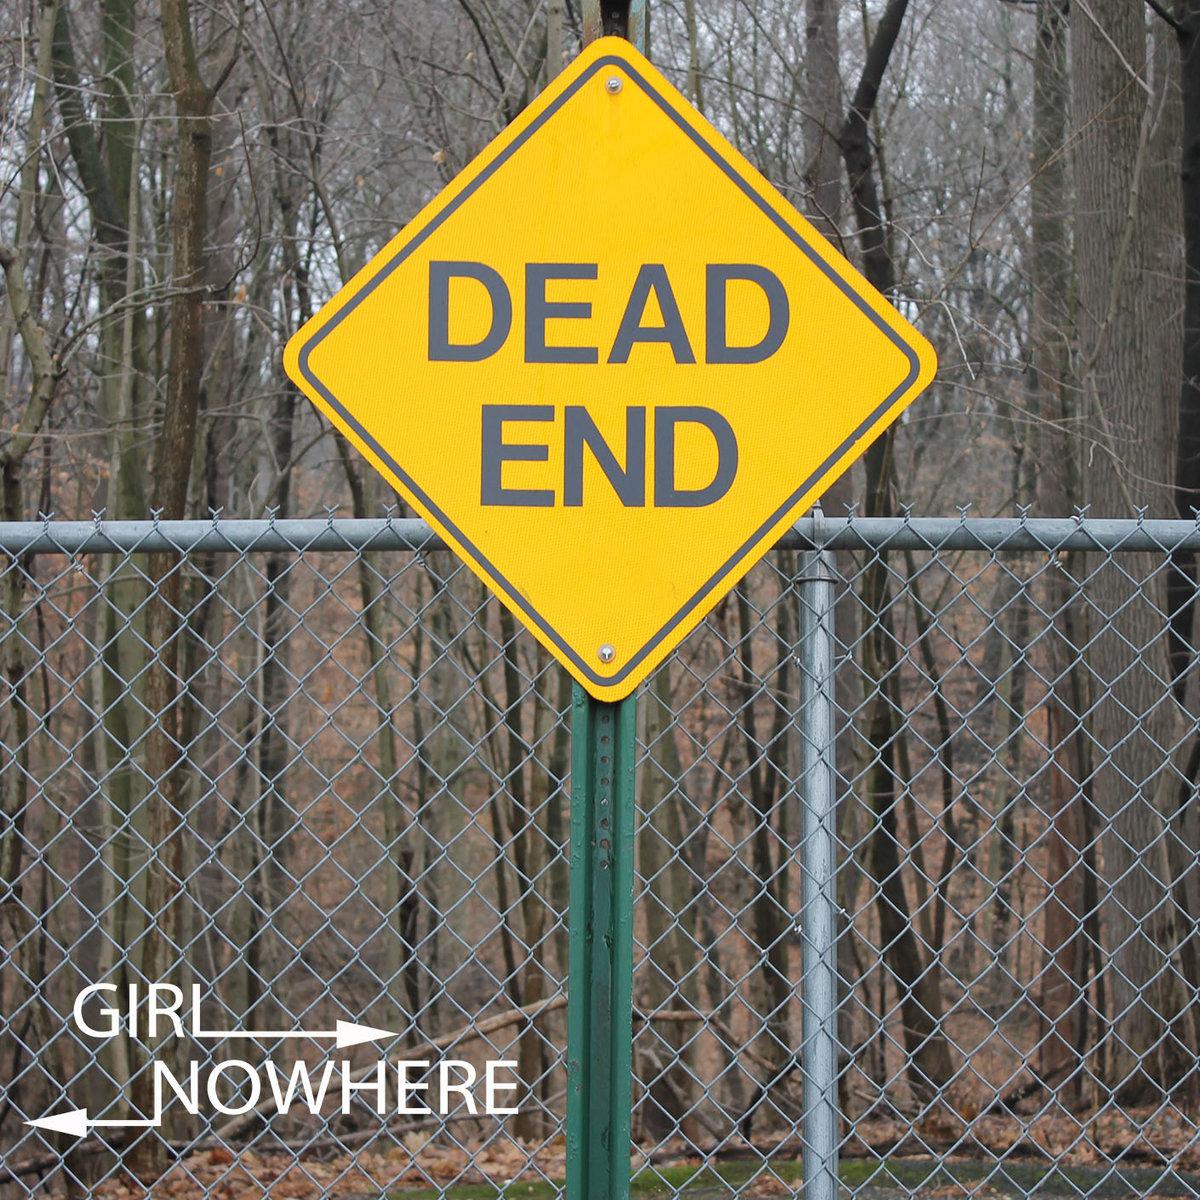 www.facebook.com/girlnowhereband